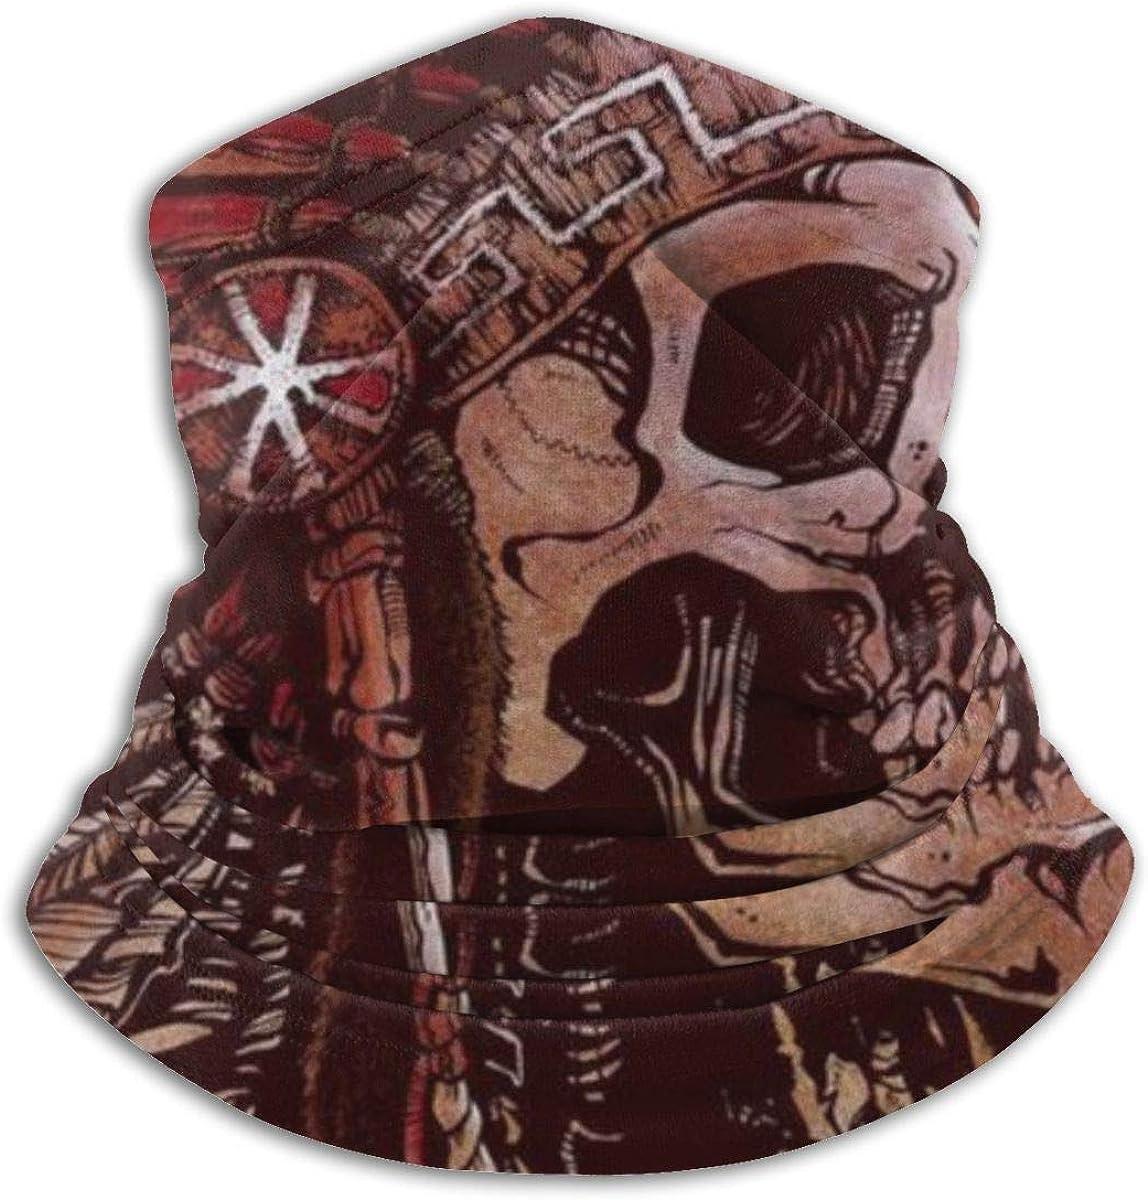 CLERO Scarf Fleece Neck Warmer Indian Native American Fea Special sale item [Alternative dealer] Skull